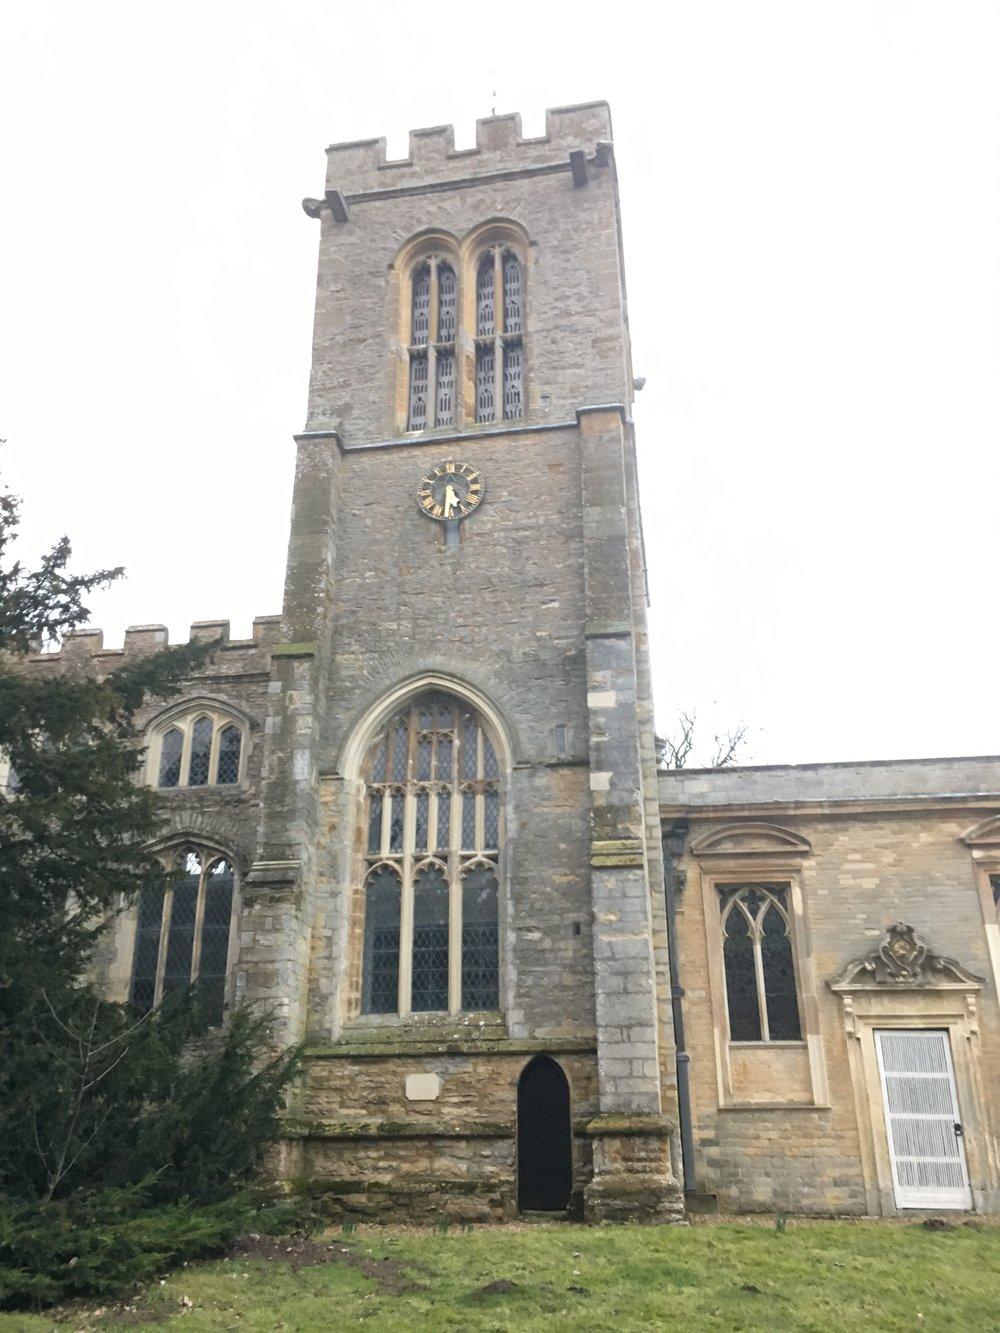 Saint Lawrence Church, Chicheley Hall, Buckimghamshire